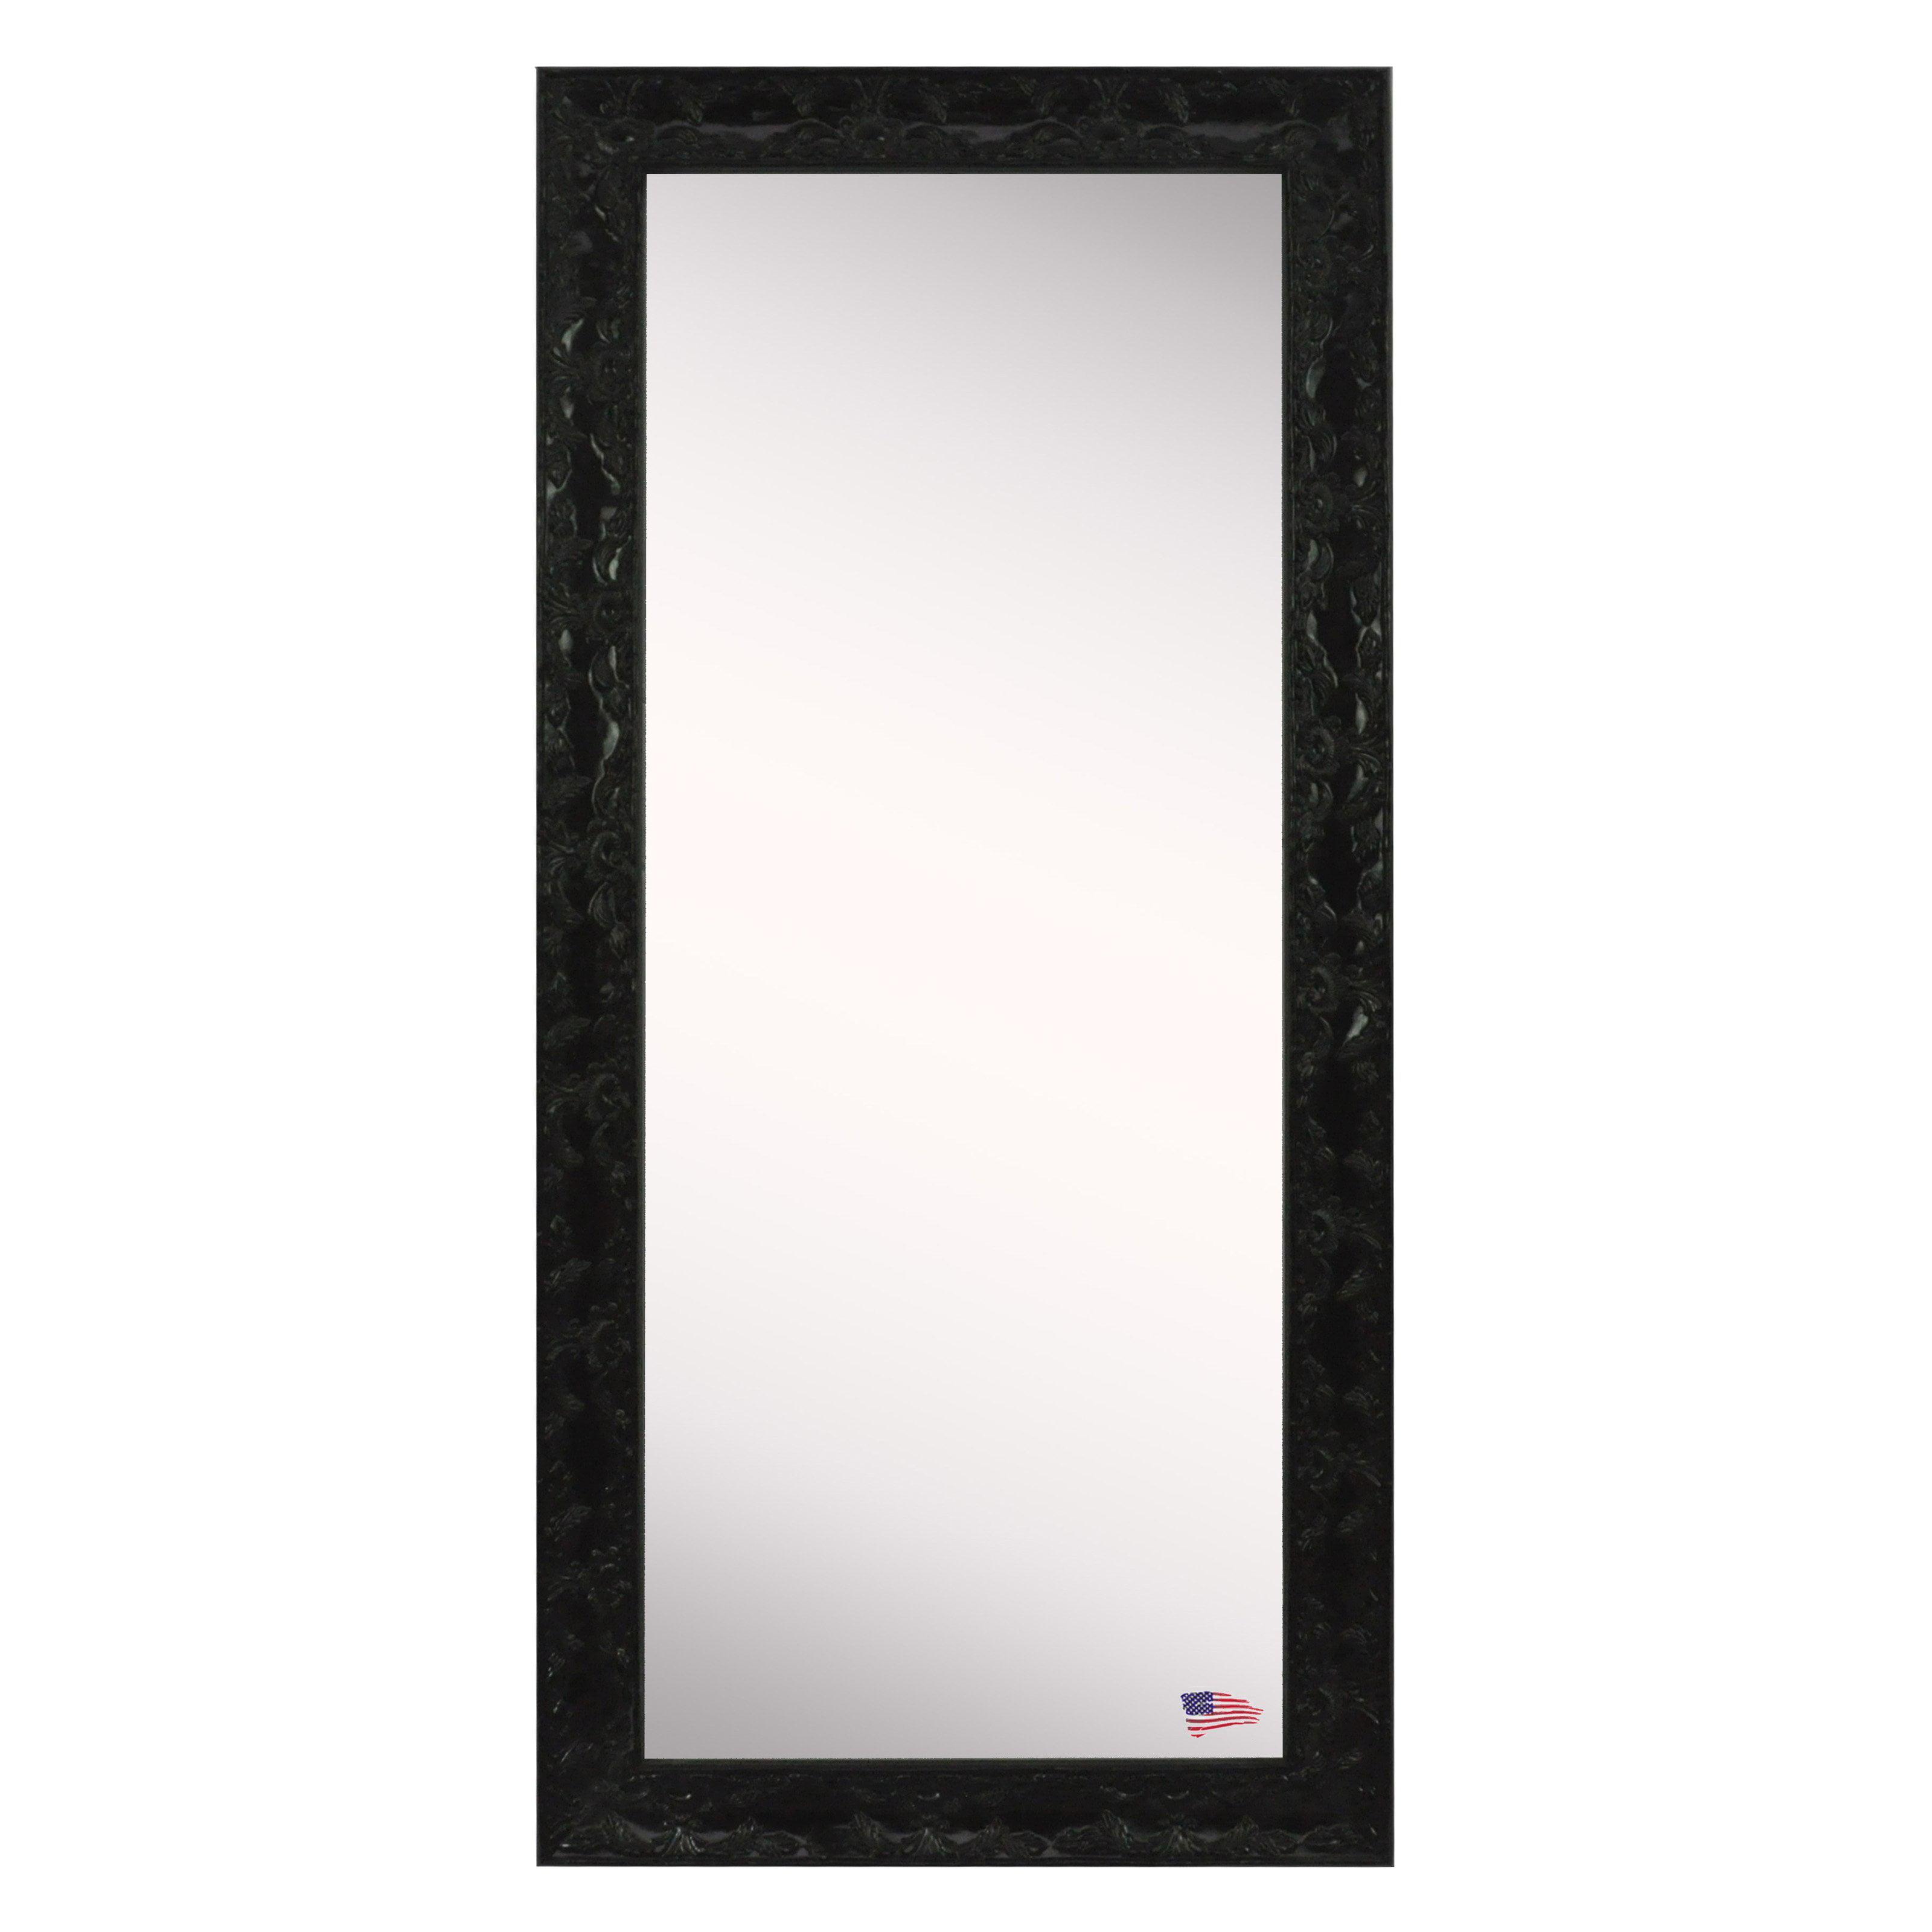 American Made Rayne Endicott Floor Mirror Black by Rayne Mirrors